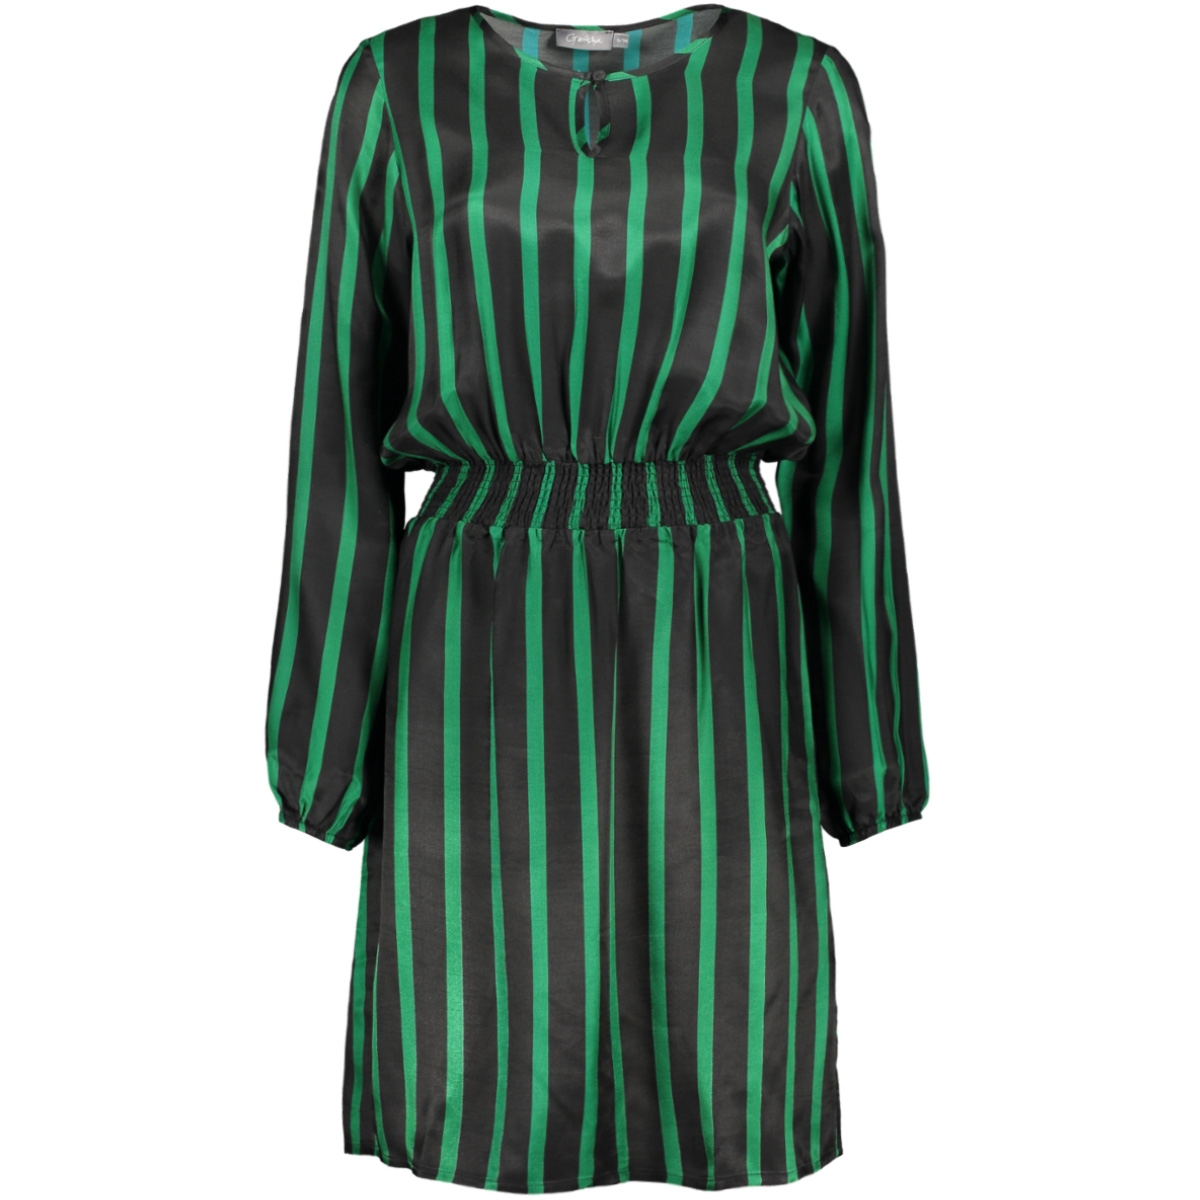 dress stripe elastic waistband 97834 geisha jurk green black combi